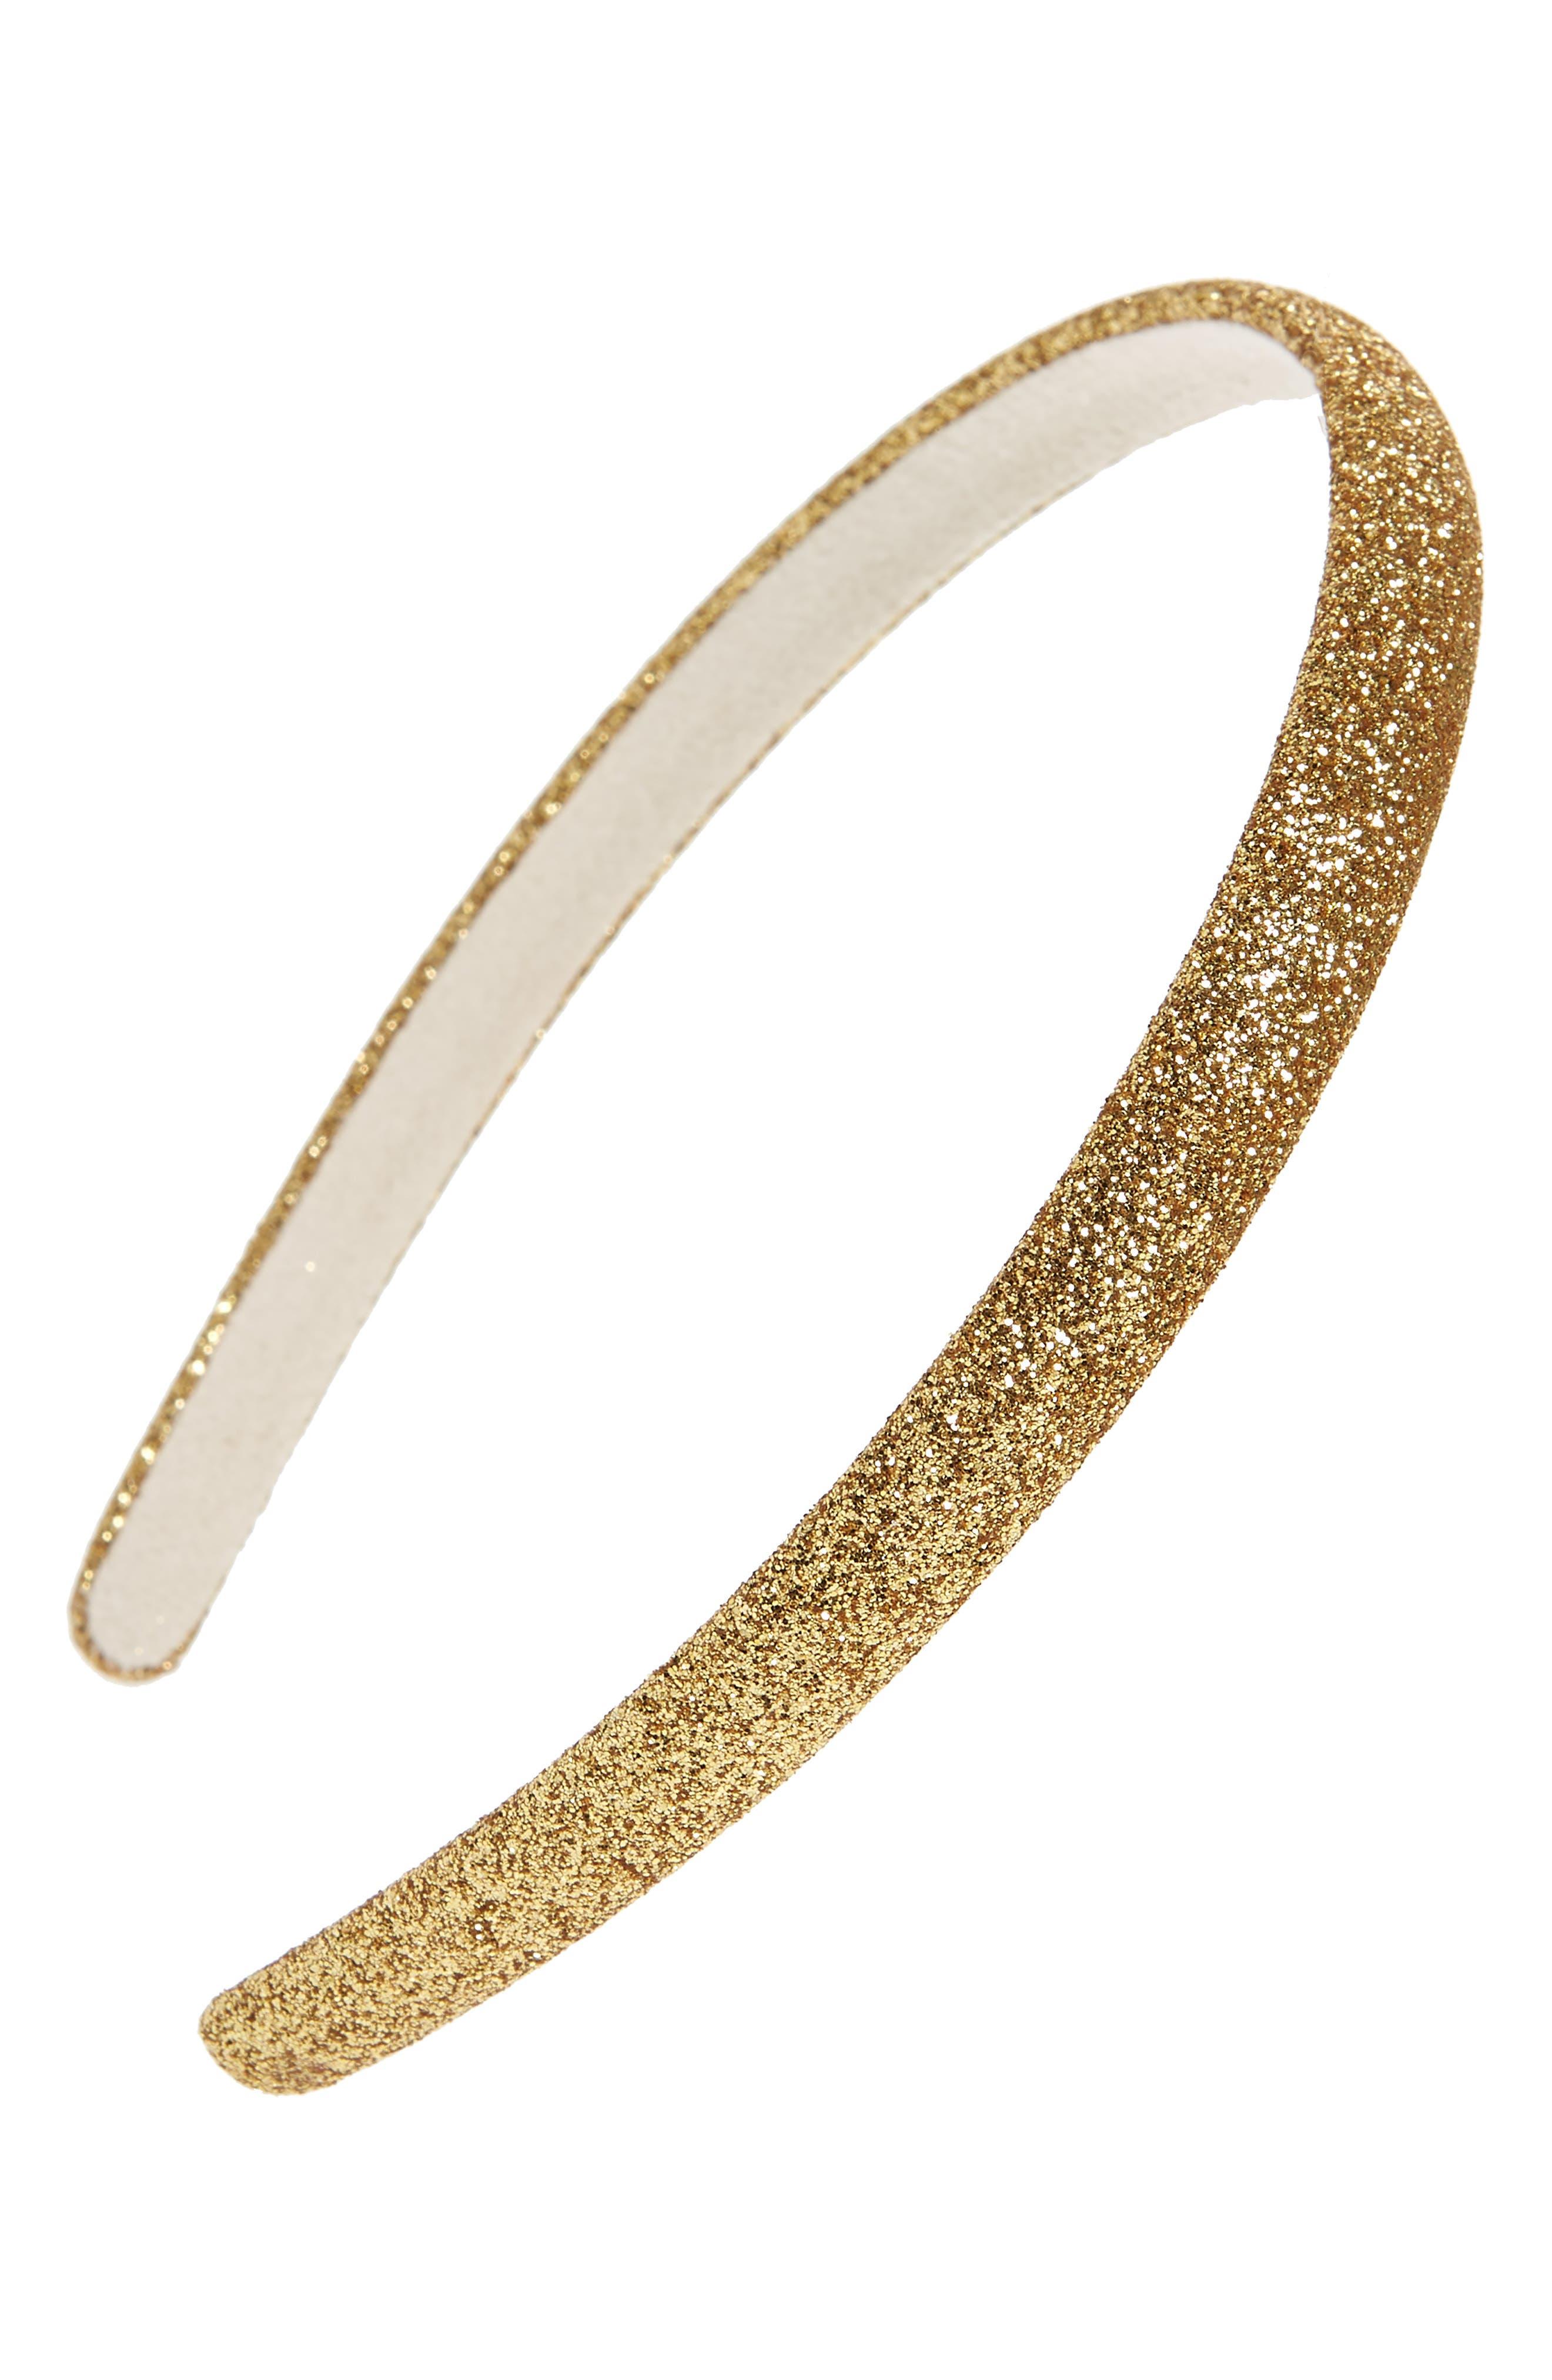 Glitter Slim Headband,                             Main thumbnail 1, color,                             GOLD